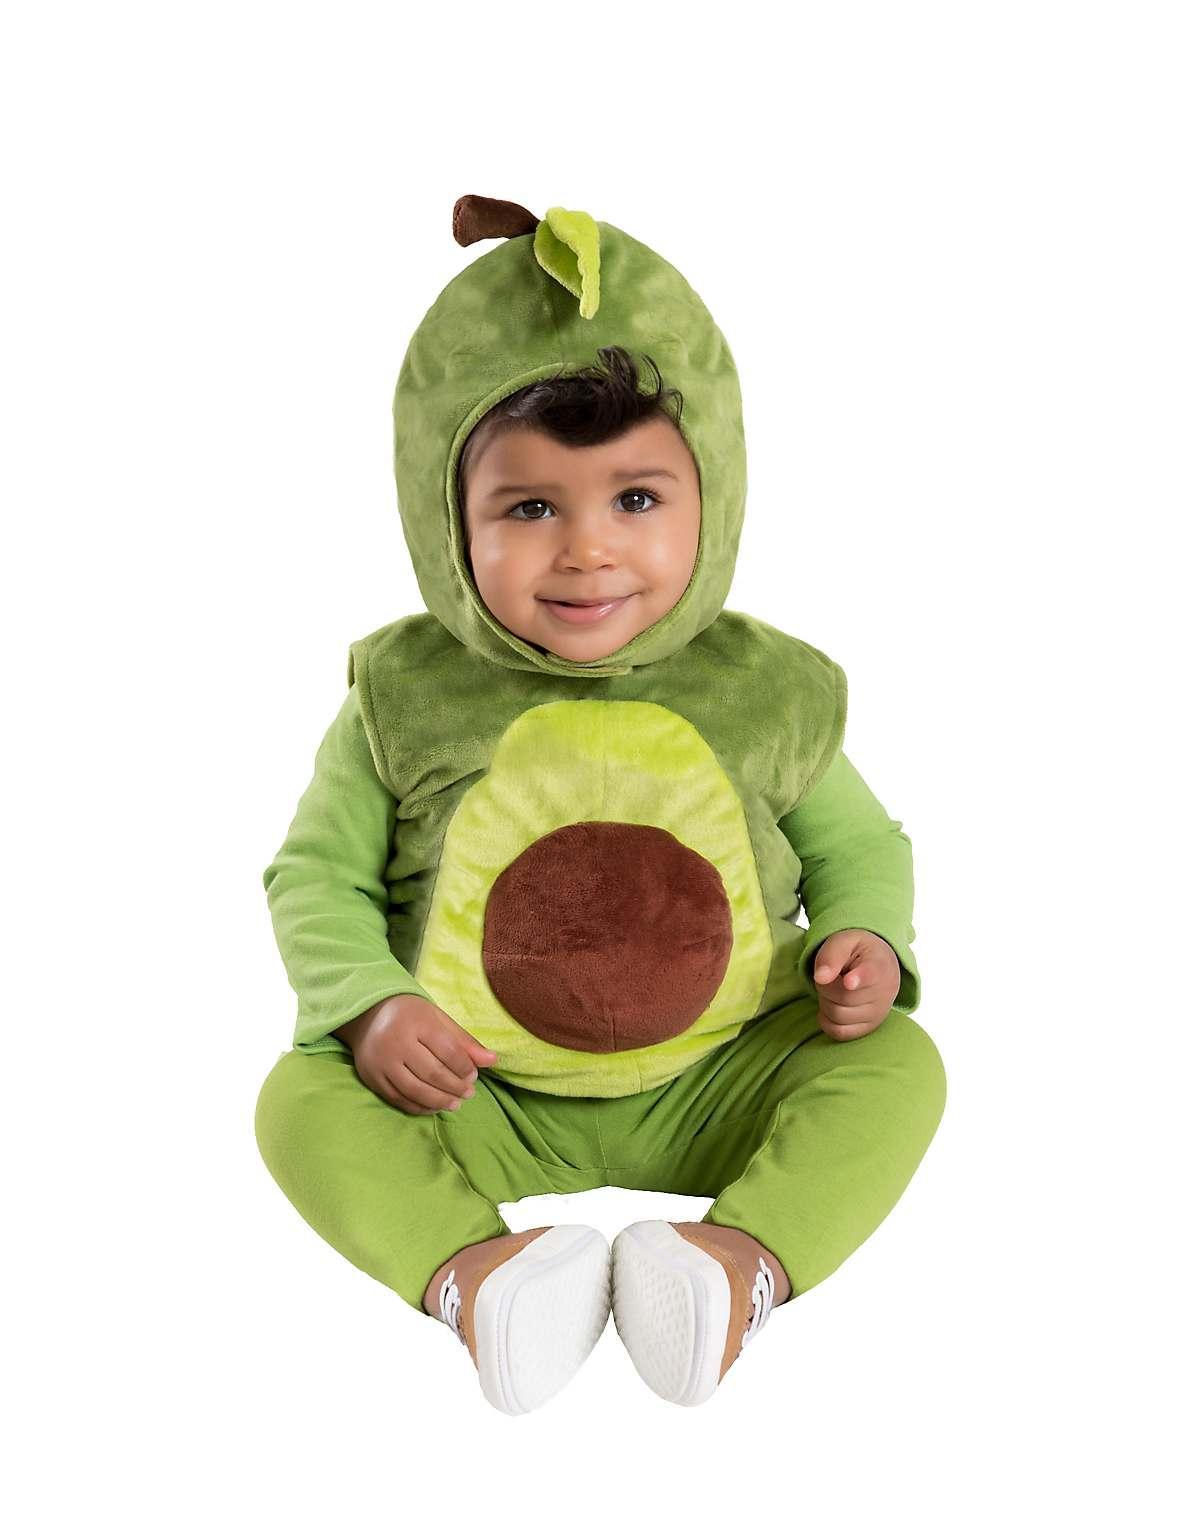 Baby plush avocado costume